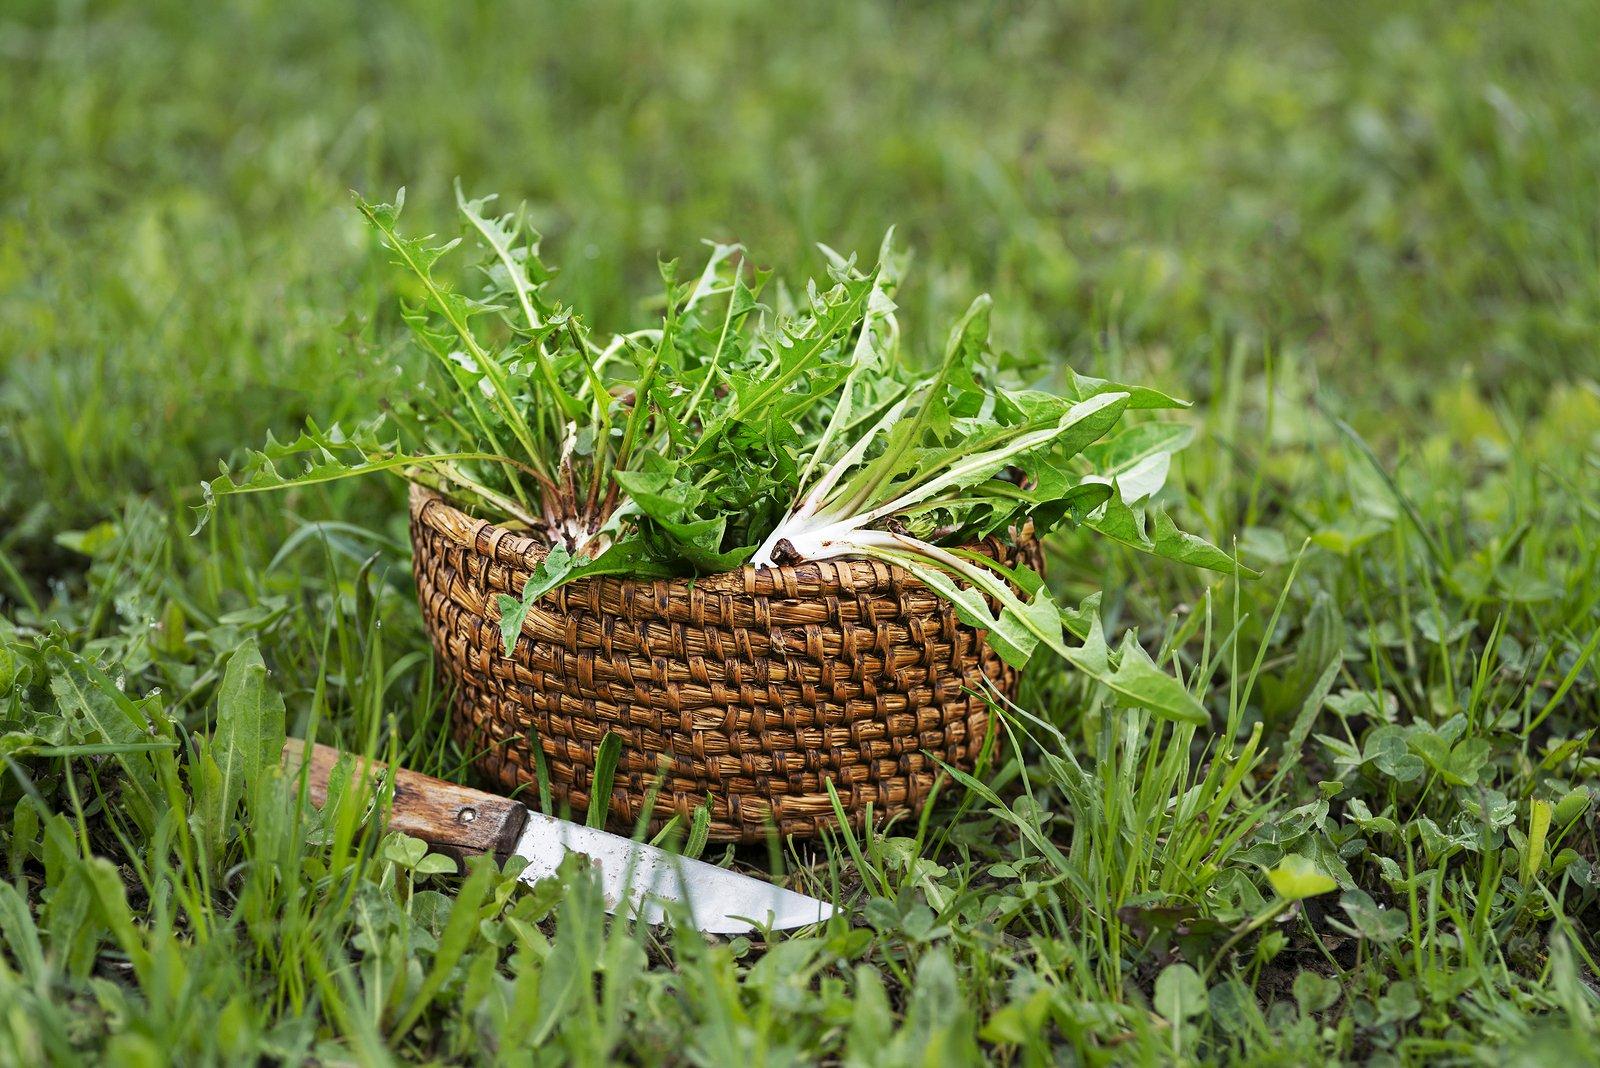 Dandelion in basket. Picked fresh dandelion leaves in garden.